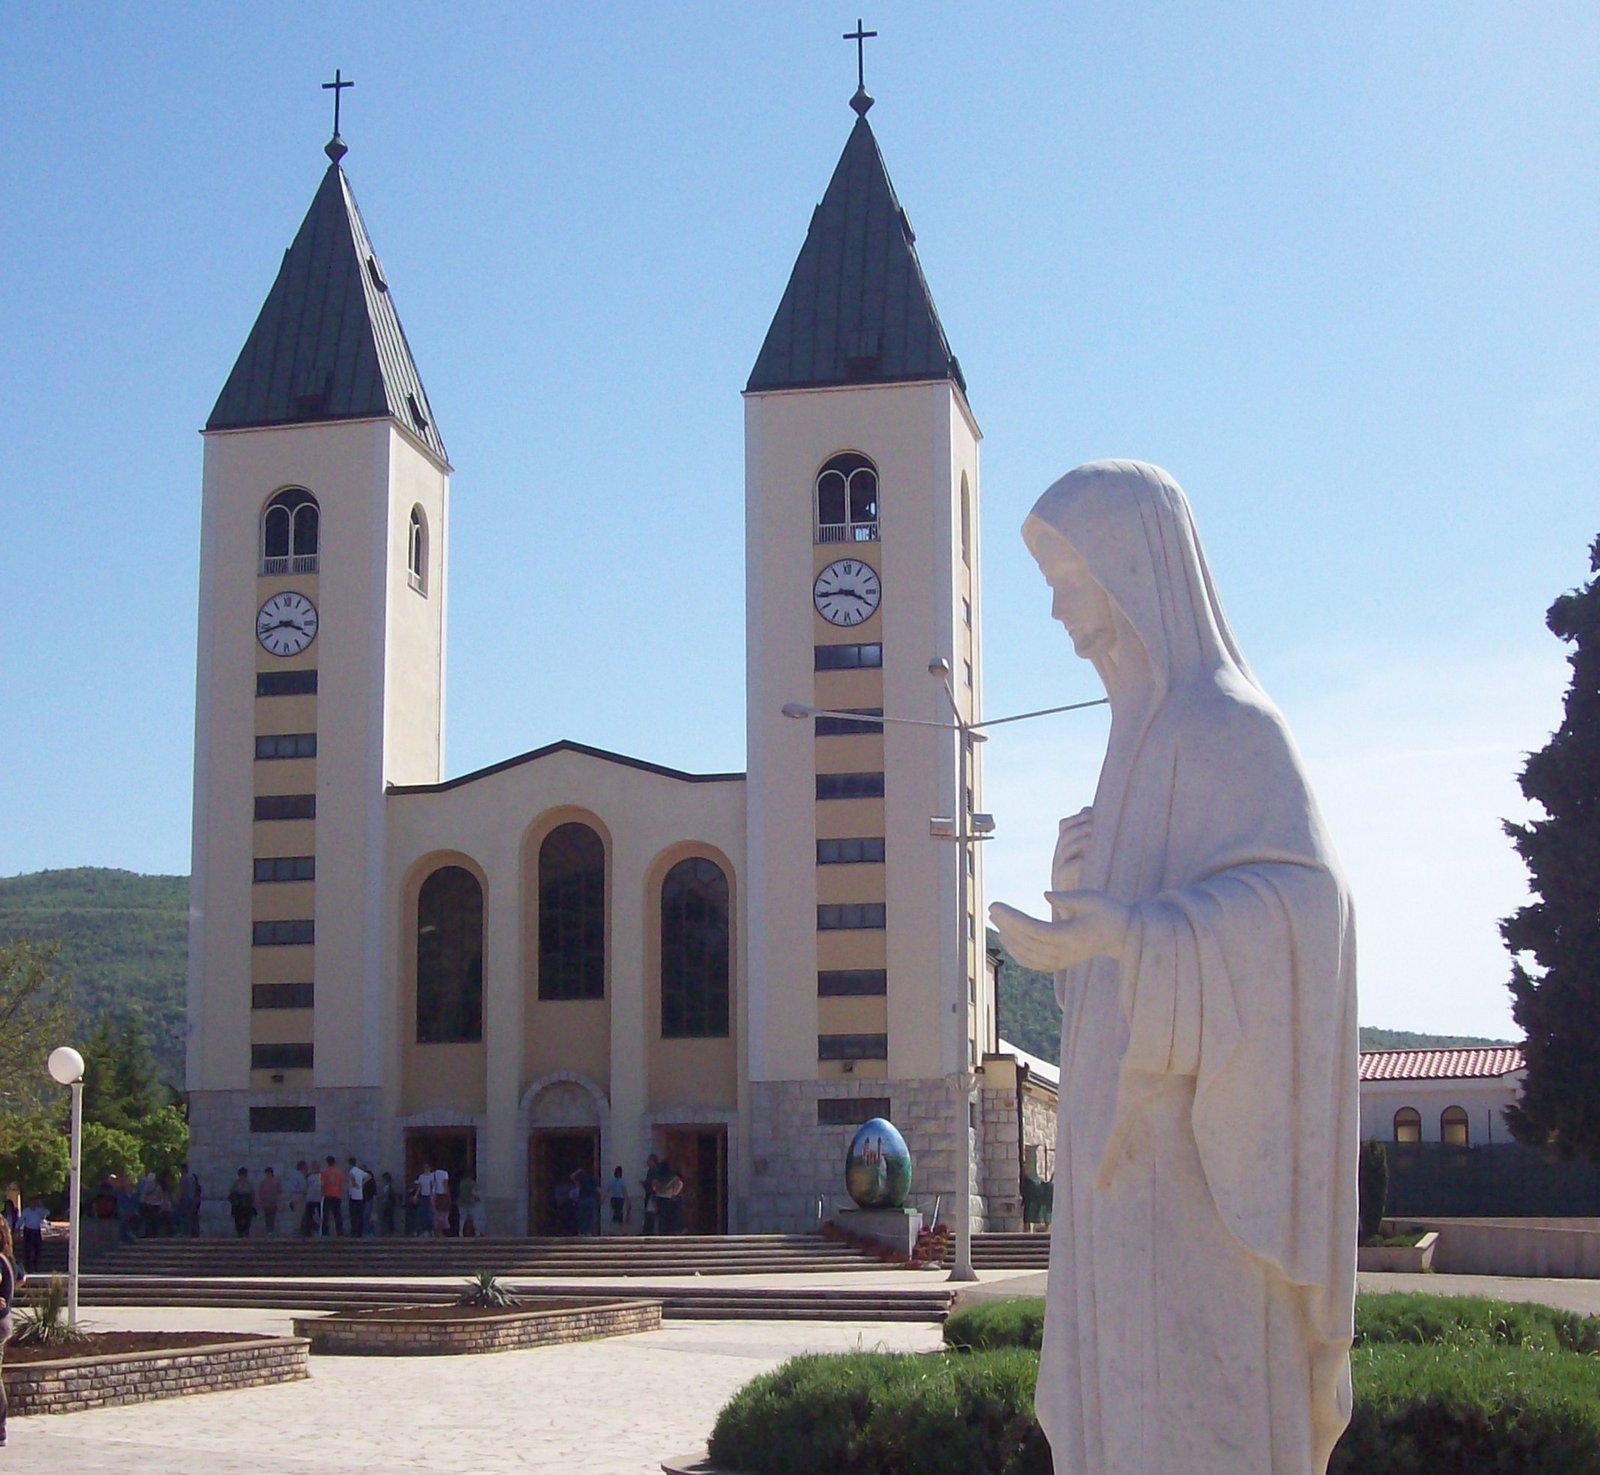 Wallfahrtskirche in Medjugorje - Herzegowina